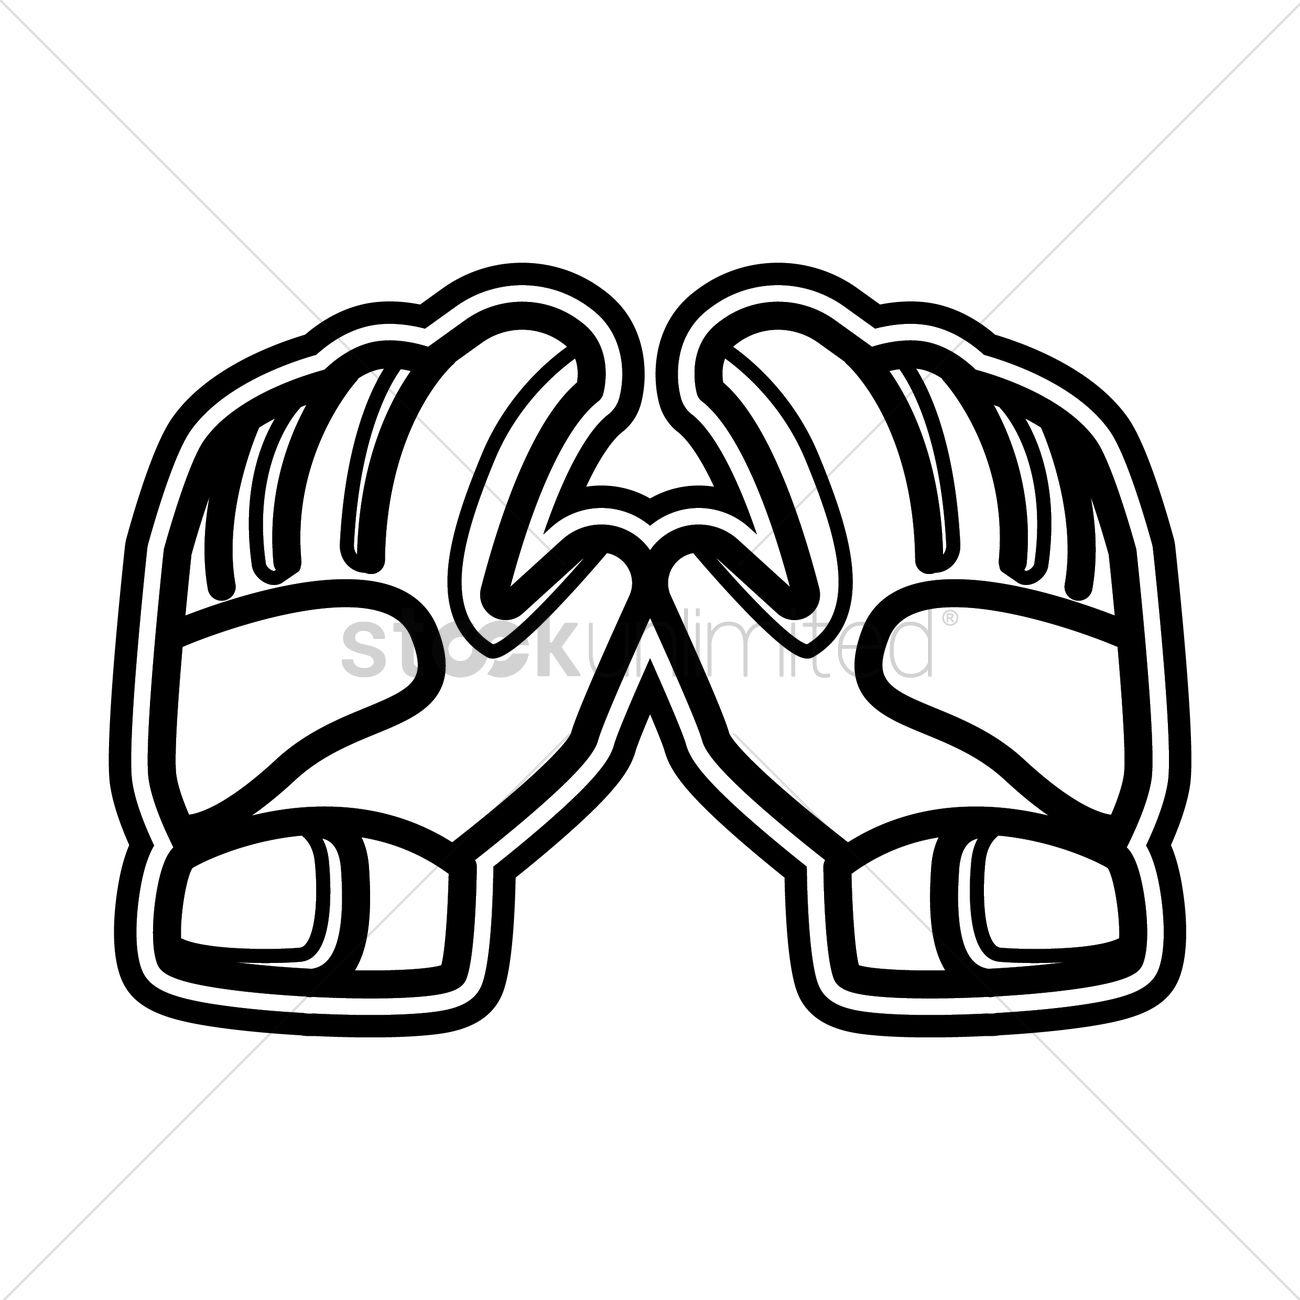 Goalkeeper Gloves Vector Image